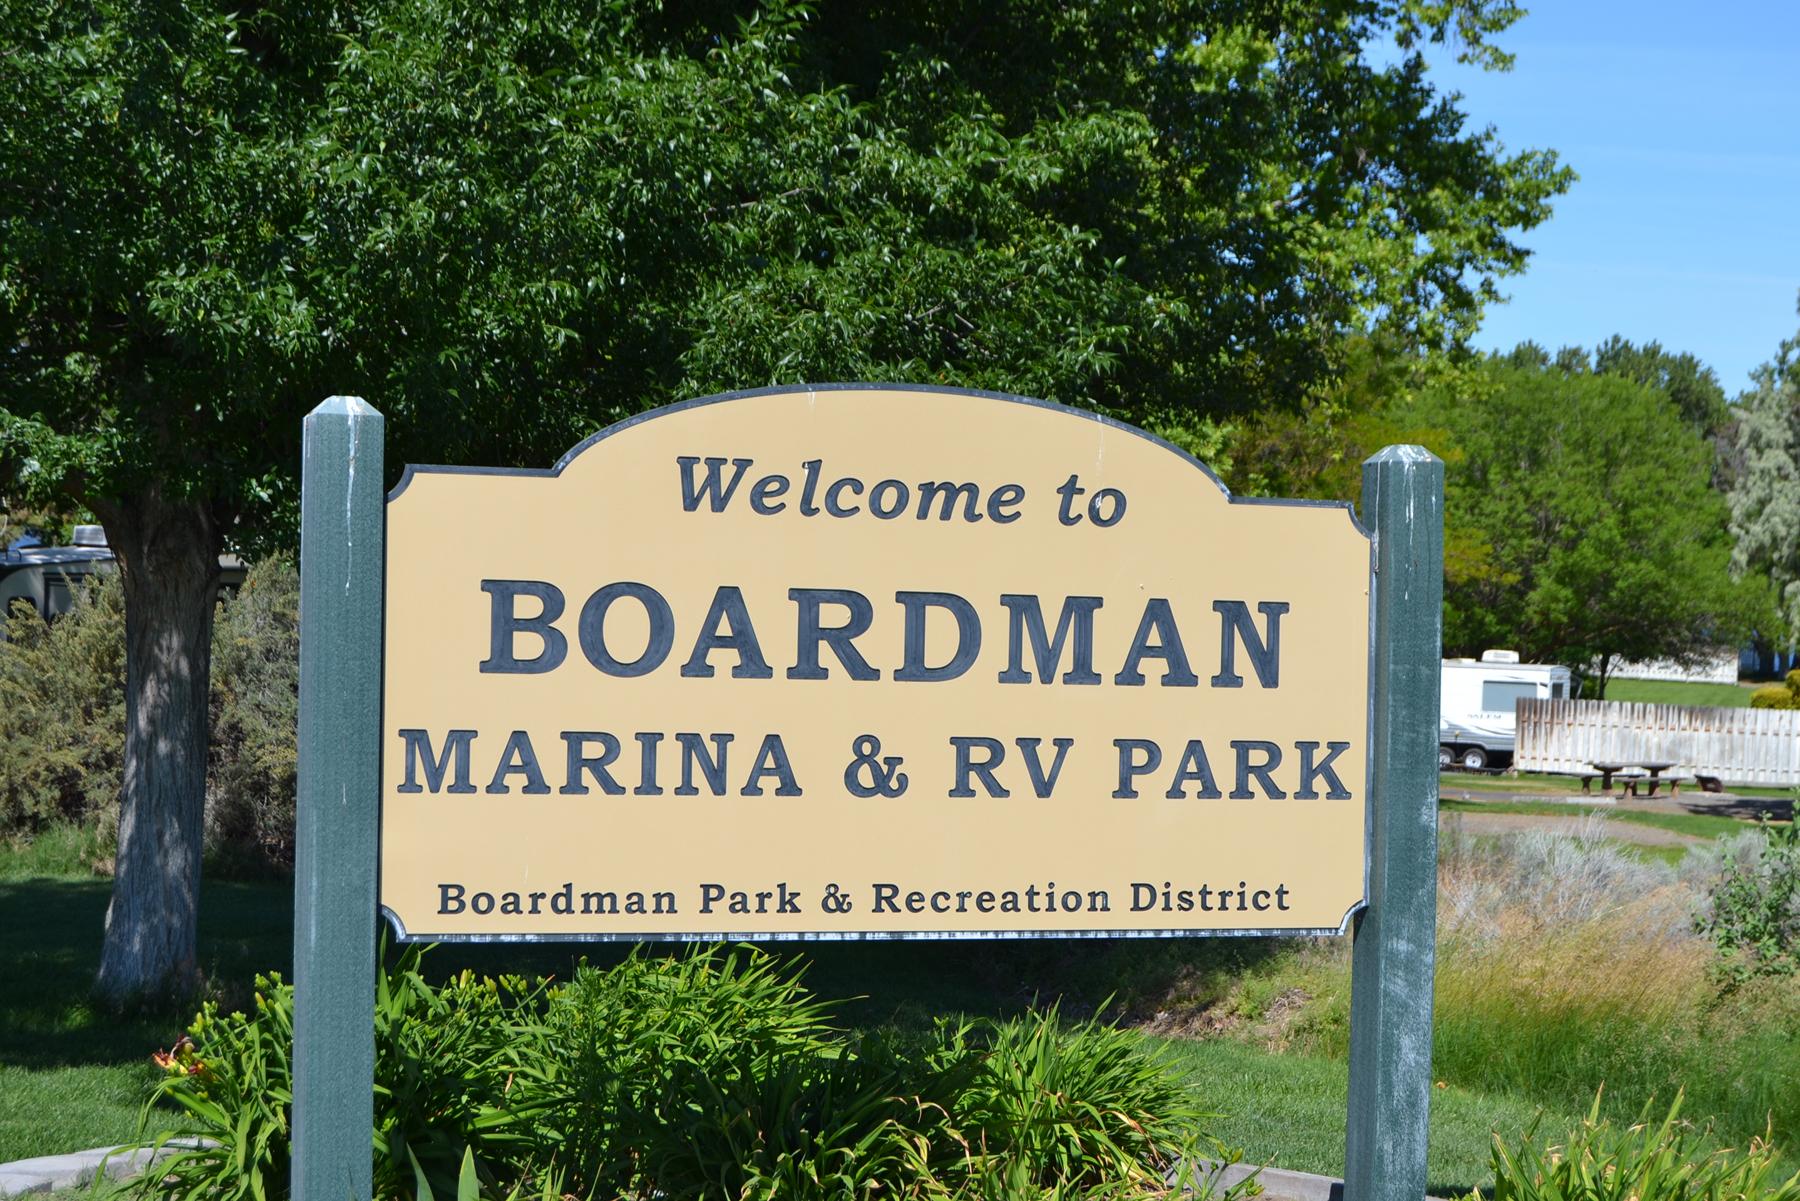 Welcome to Boardman Marina & RV Park, Boardman Park & Recreational District sign.